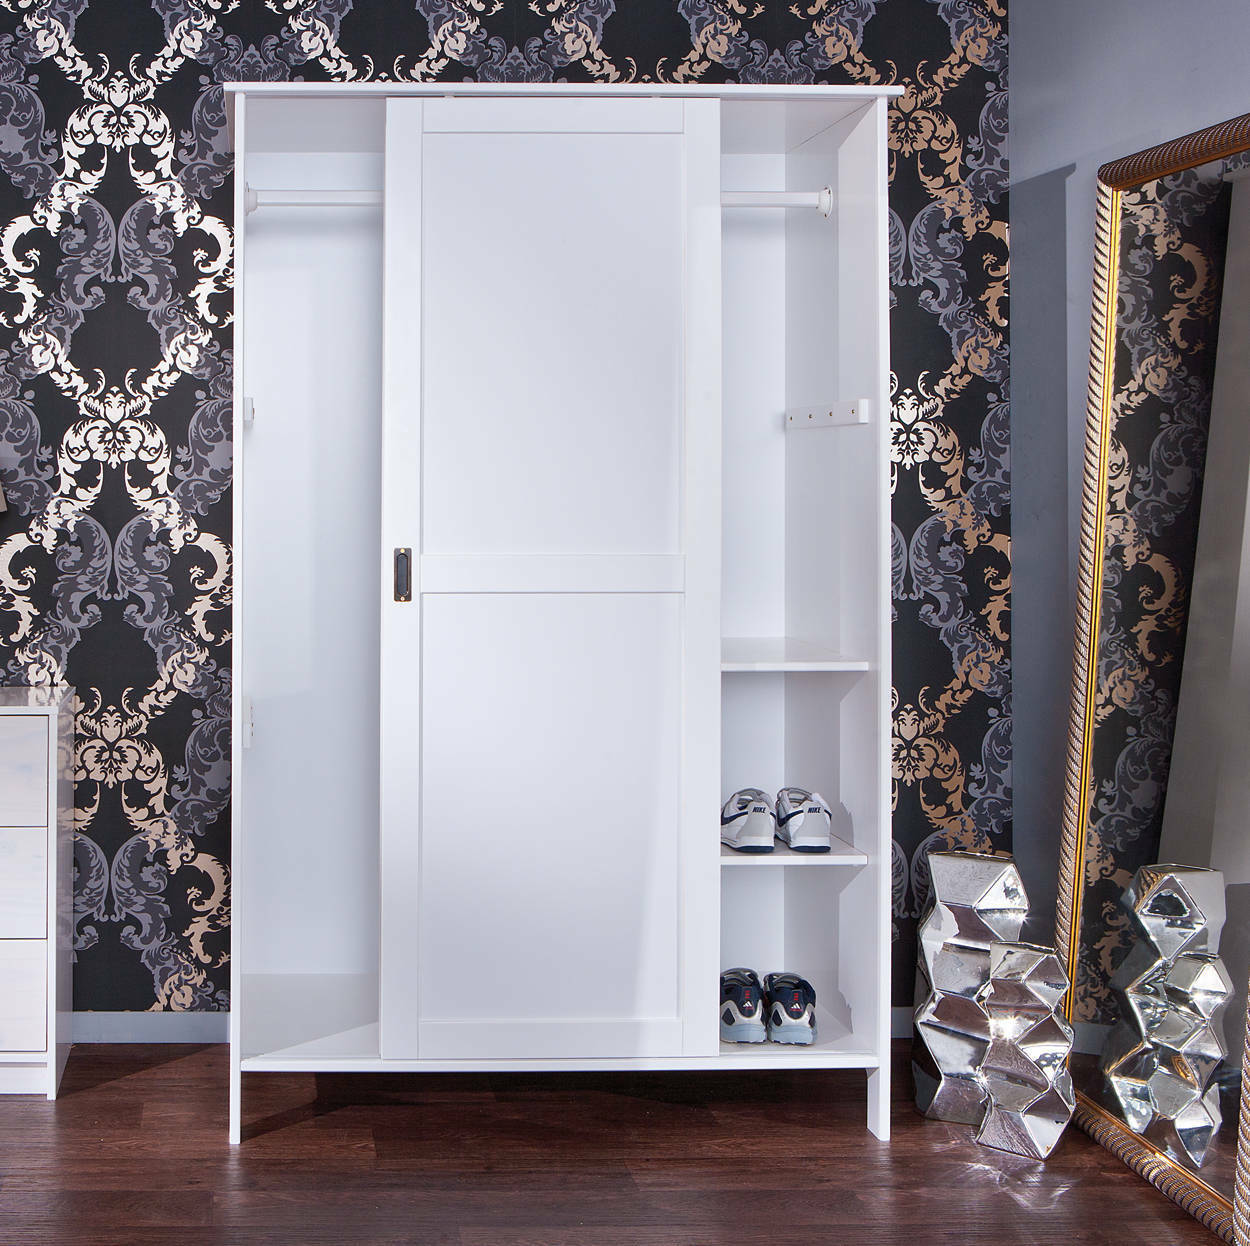 schrank kleiderschrank wandschrank 2 t rig wei massivholz neu eur 276 42 picclick de. Black Bedroom Furniture Sets. Home Design Ideas